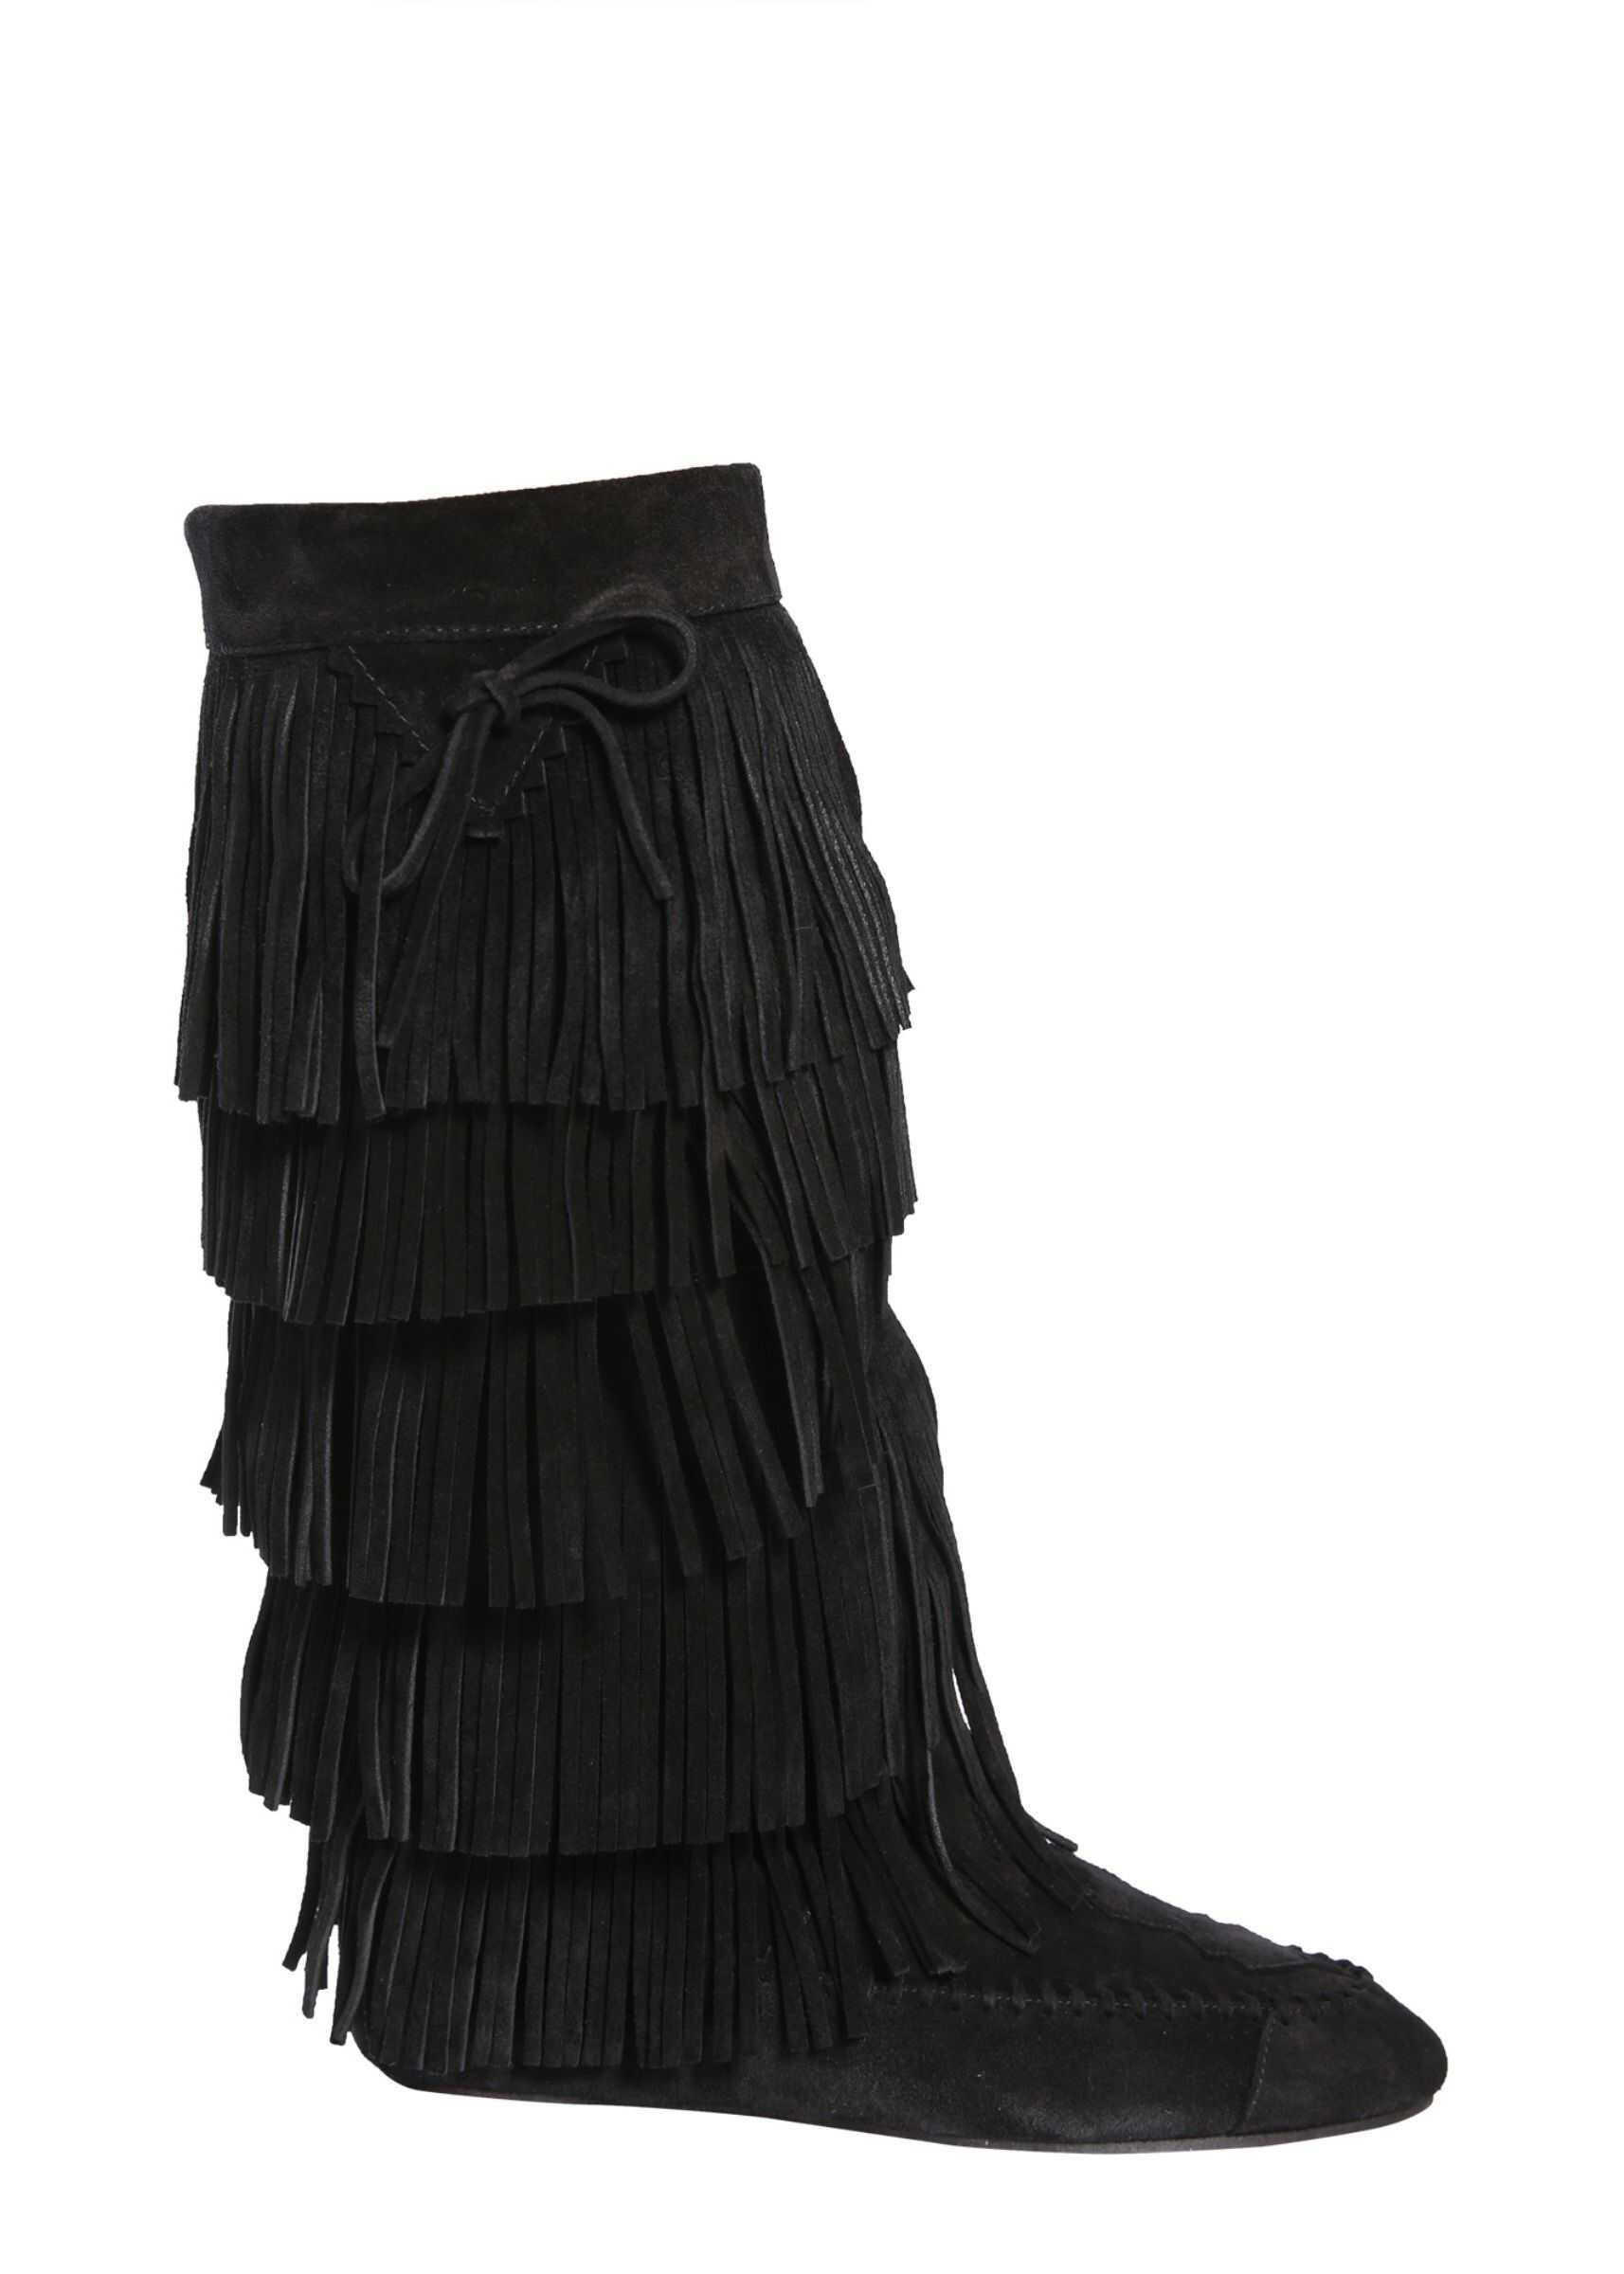 Saint Laurent Fringed Boots 529308_0SO001000 BLACK imagine b-mall.ro